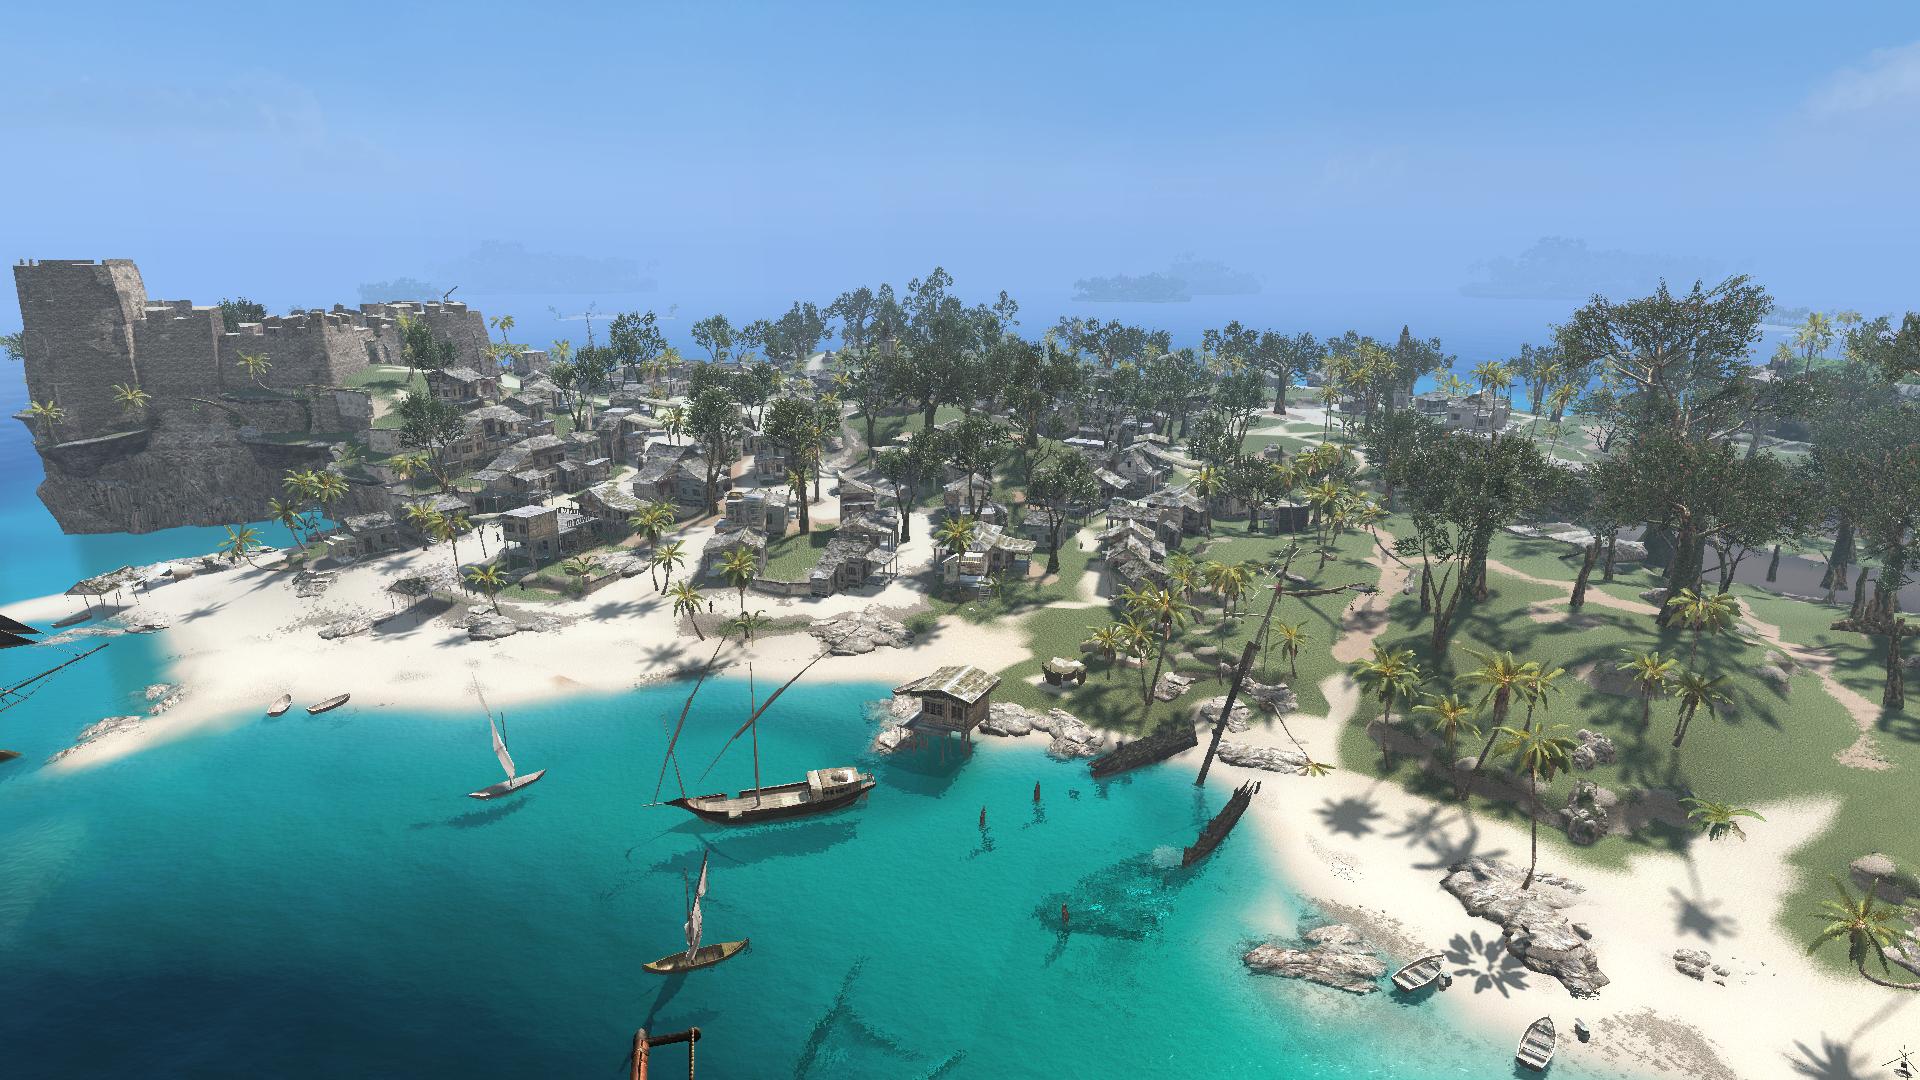 Нассау в Assassins Creed 4: Black Flag